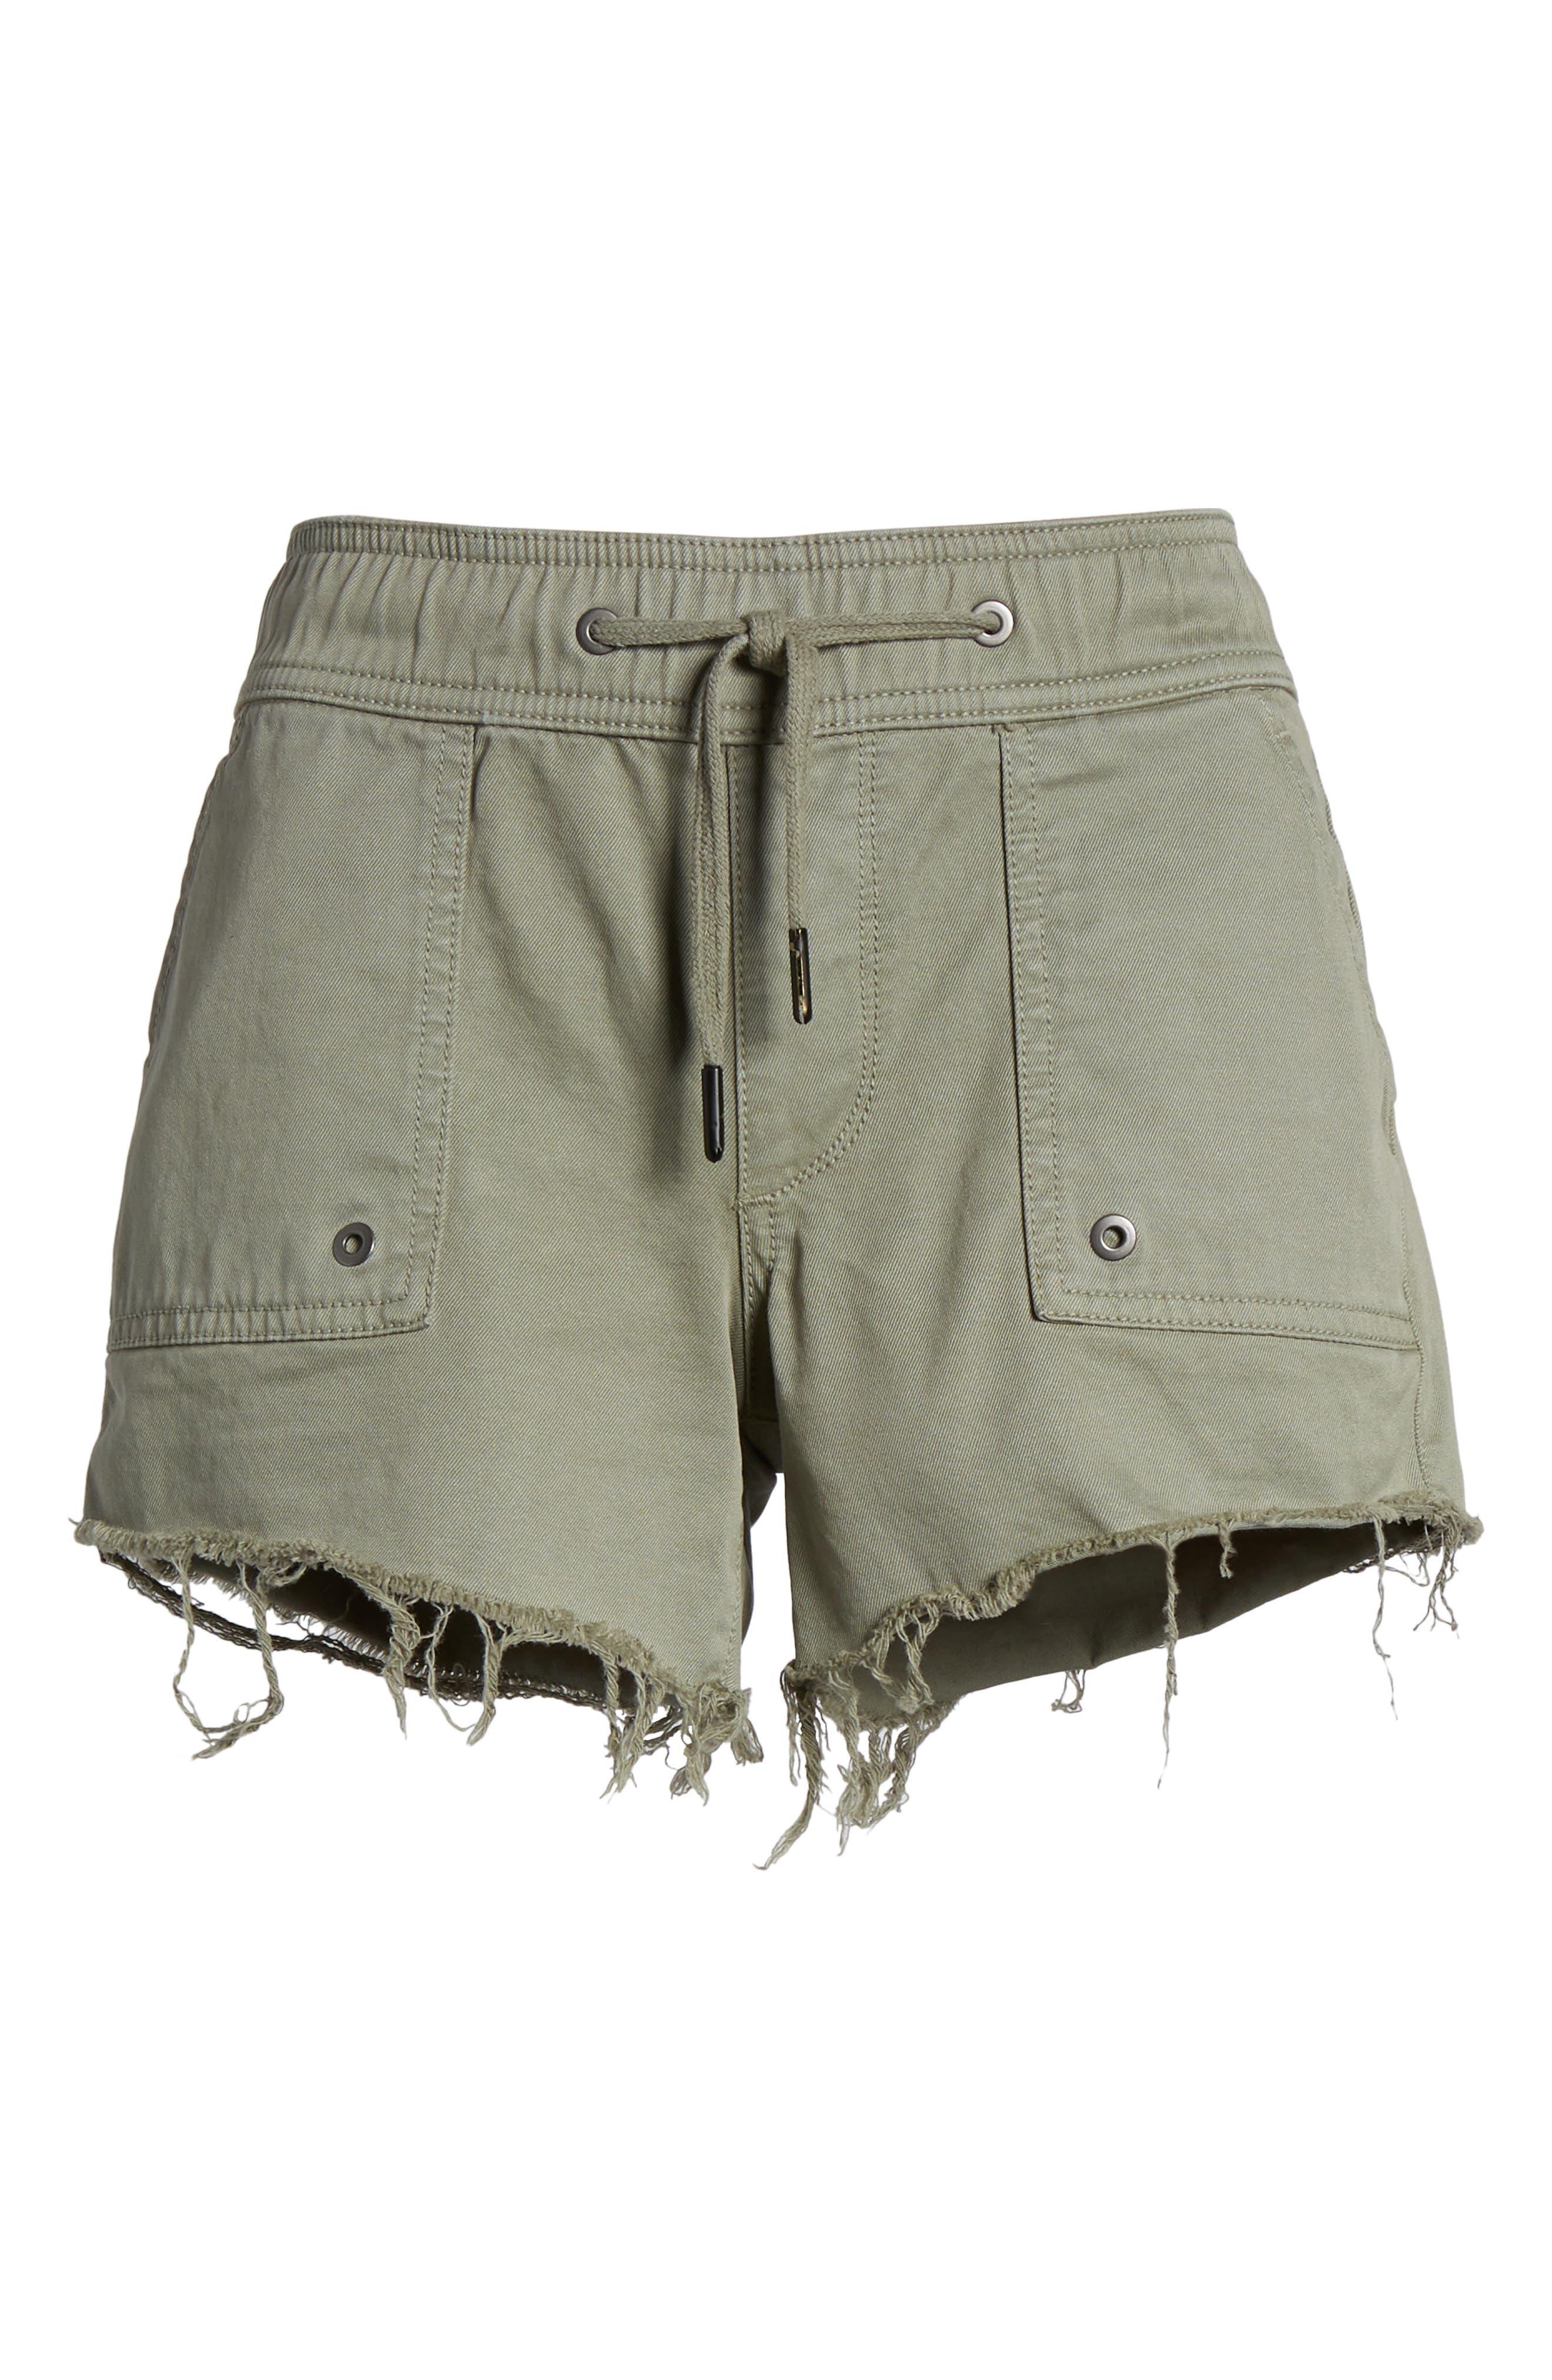 Flynn Low Rise Military Shorts,                             Alternate thumbnail 7, color,                             410